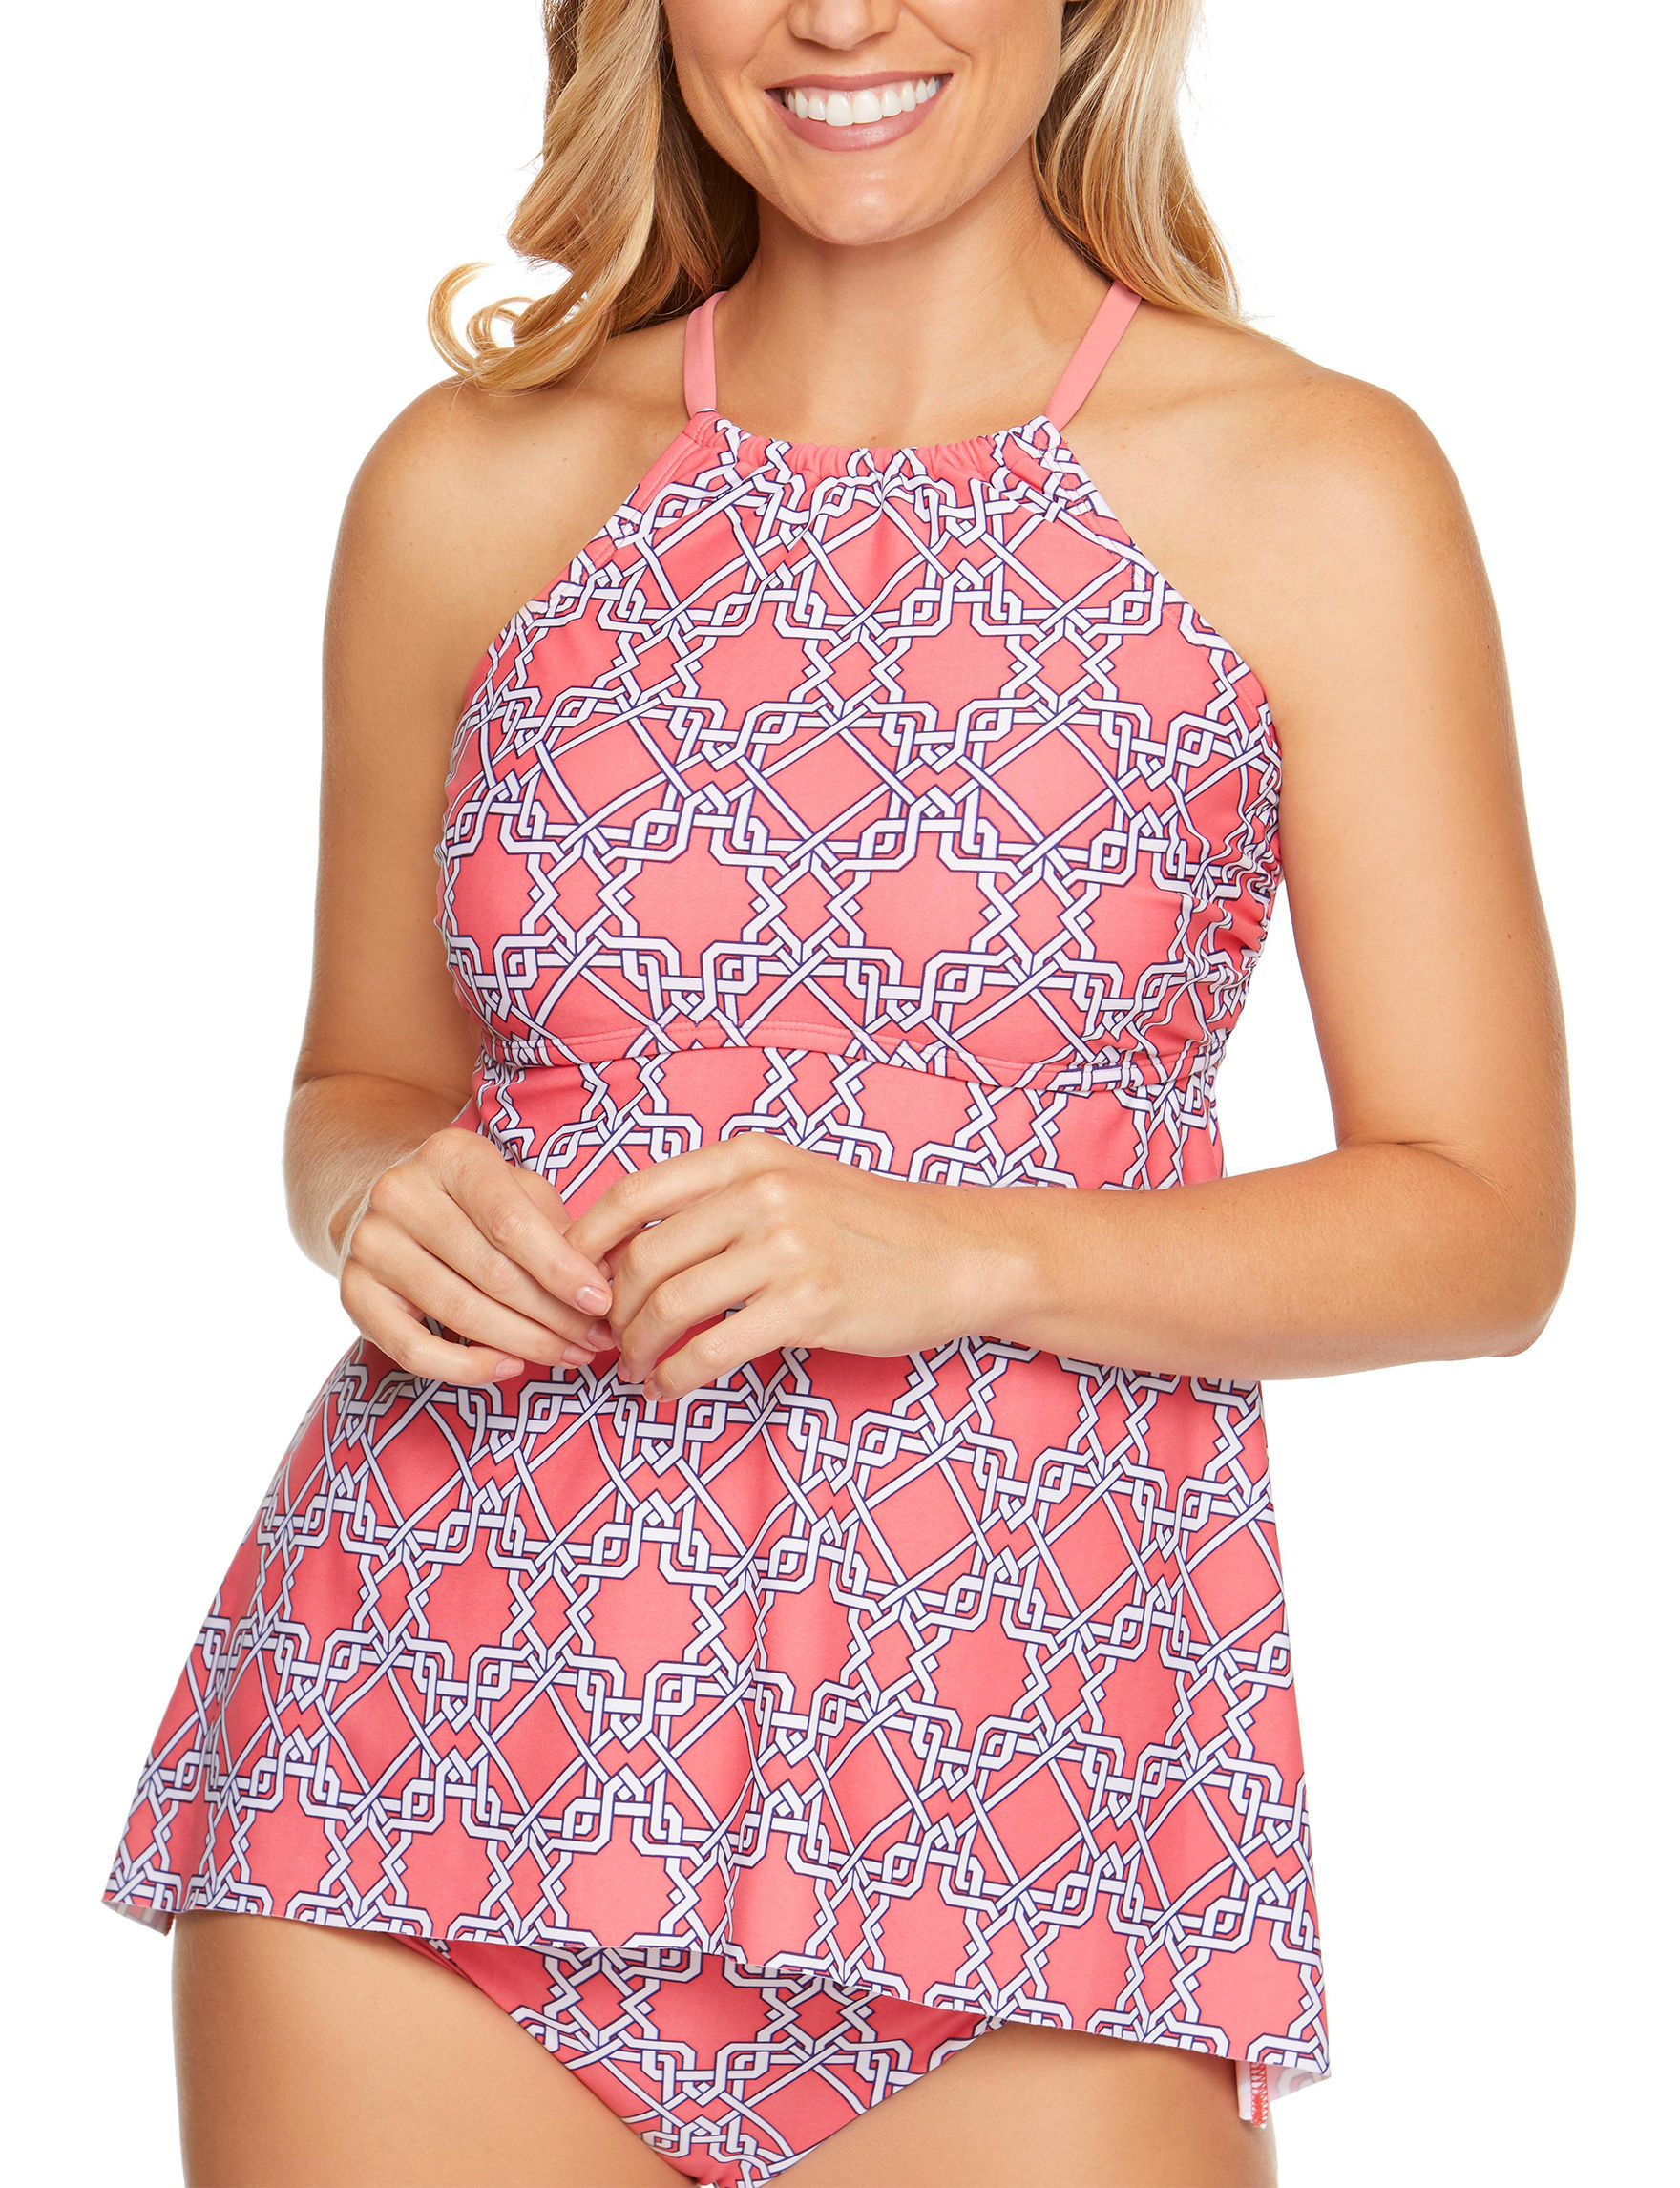 Aqua Couture Coral Swimsuit Tops High Neck Tankini